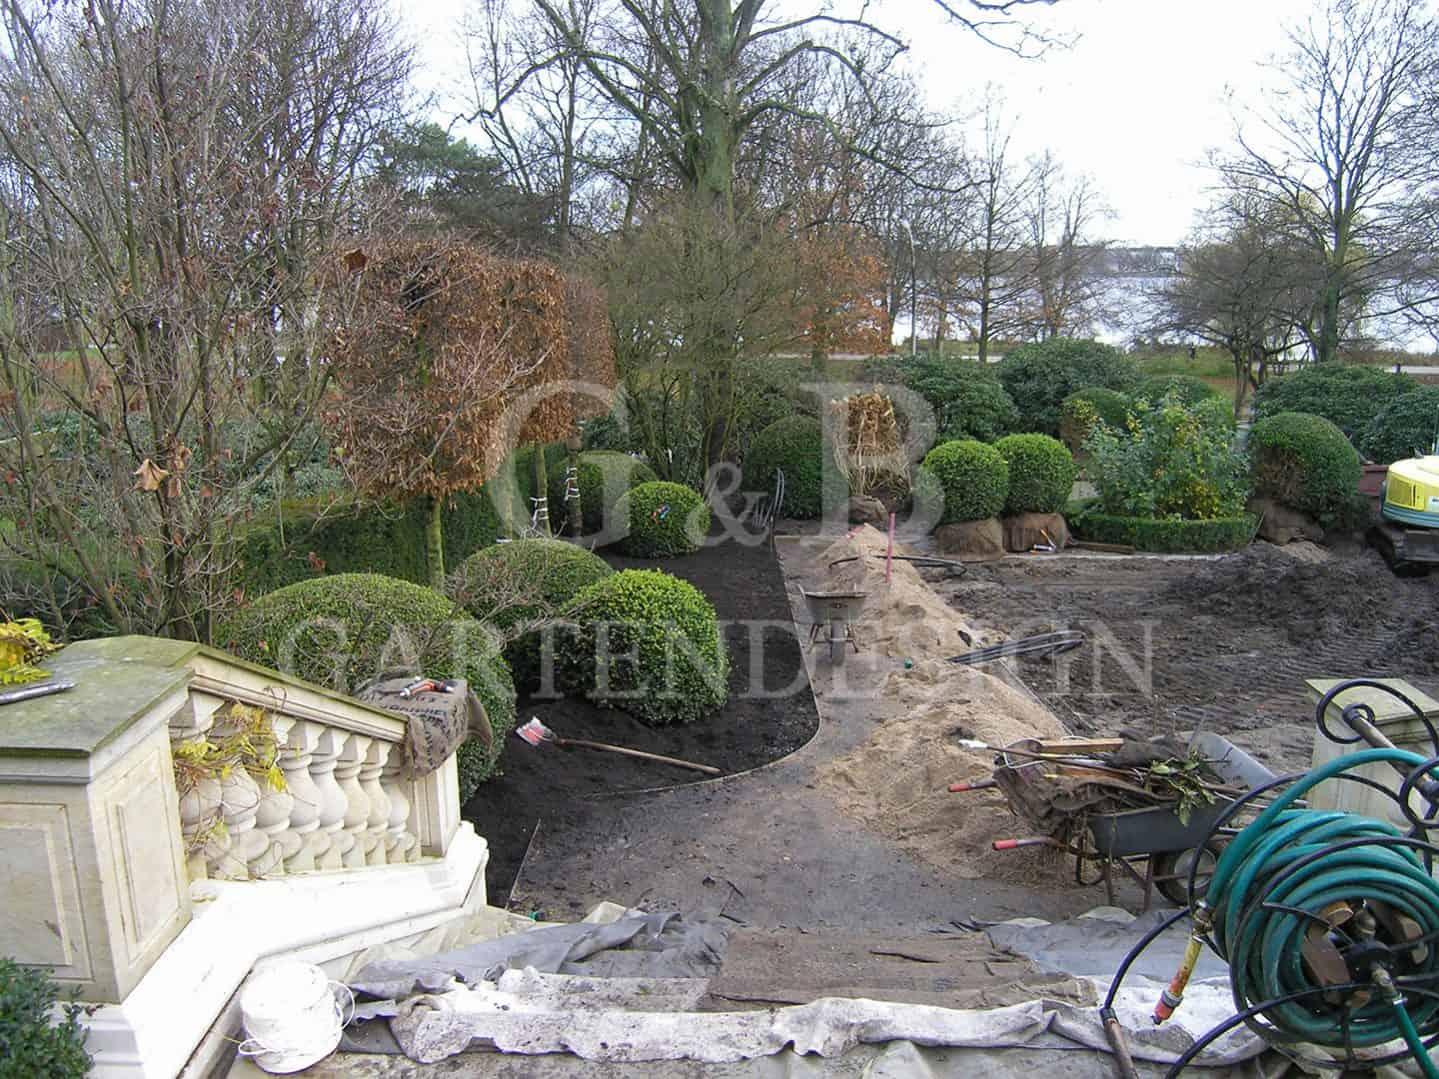 gartenbau landschaftsbau lanschaftsgärtner